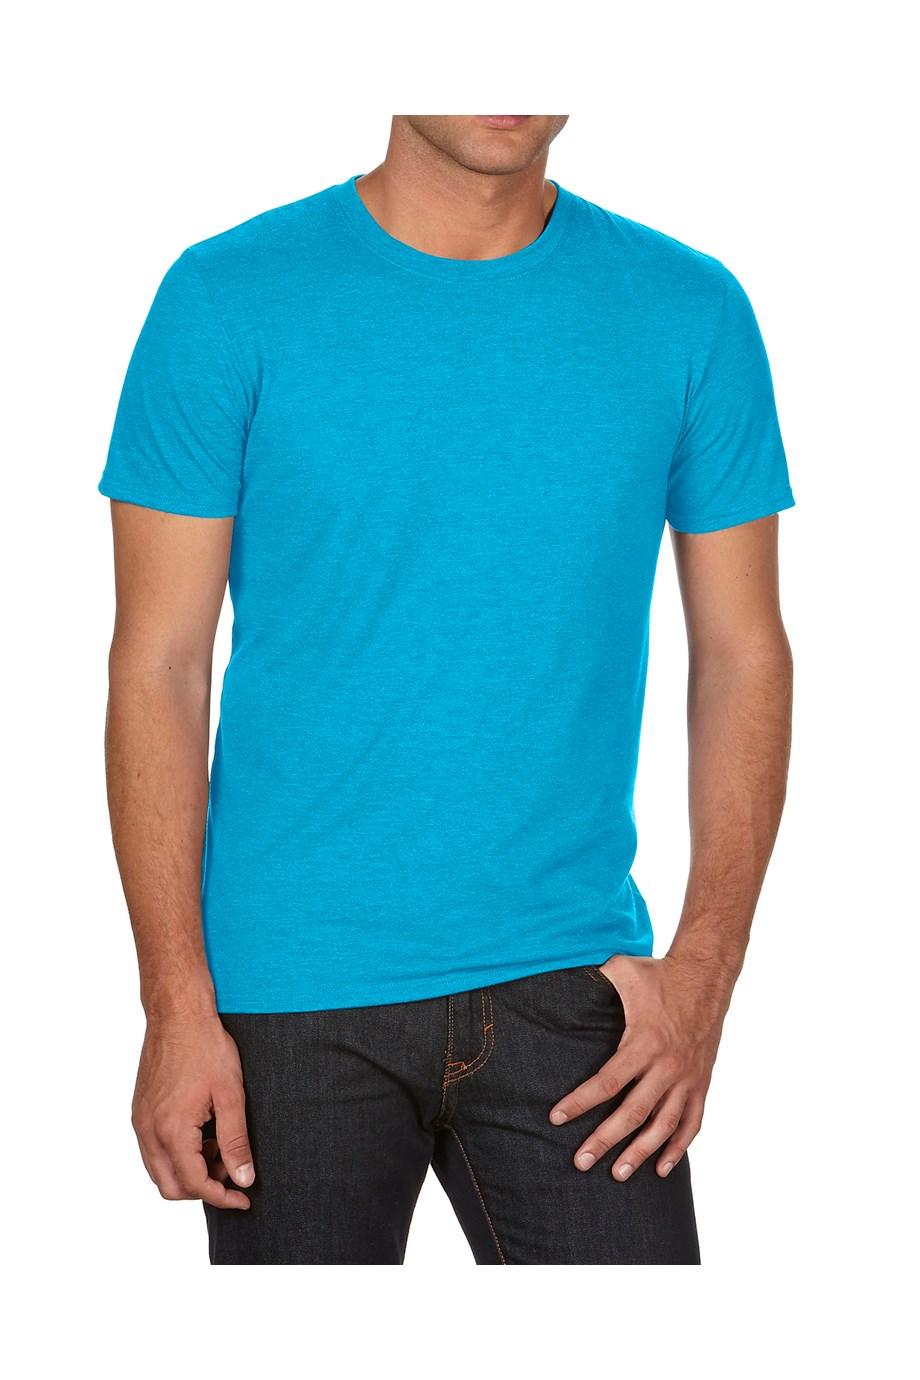 heather caribbean blue